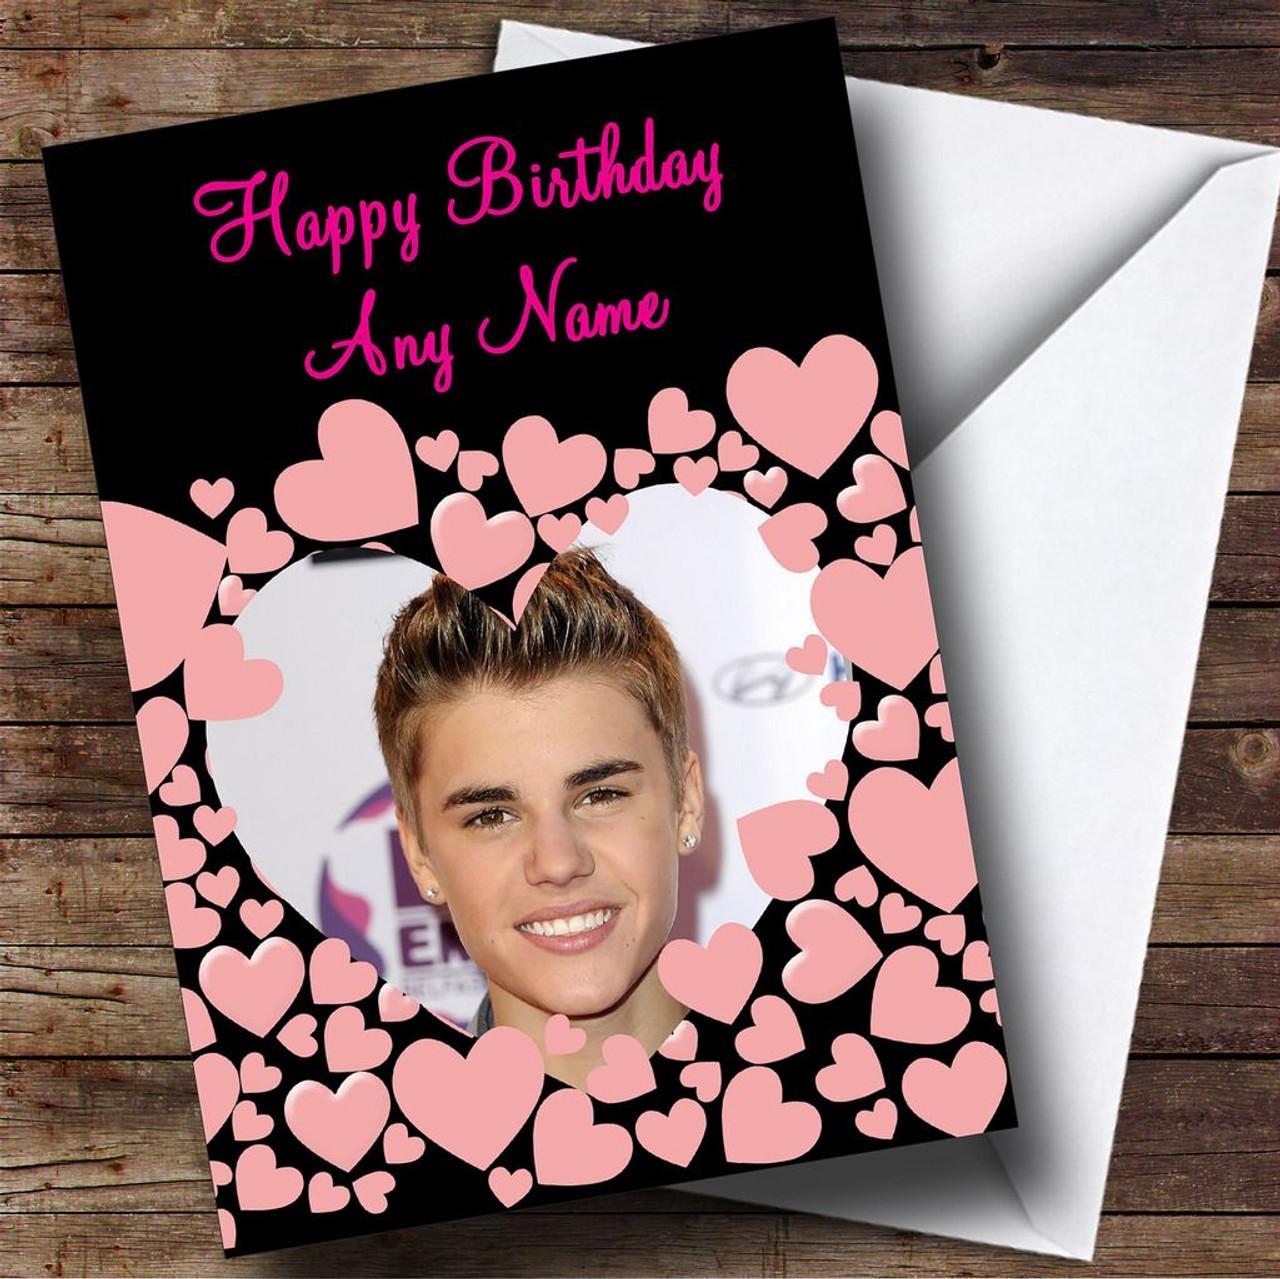 Justin Bieber Pink Hearts Personalised Birthday Card